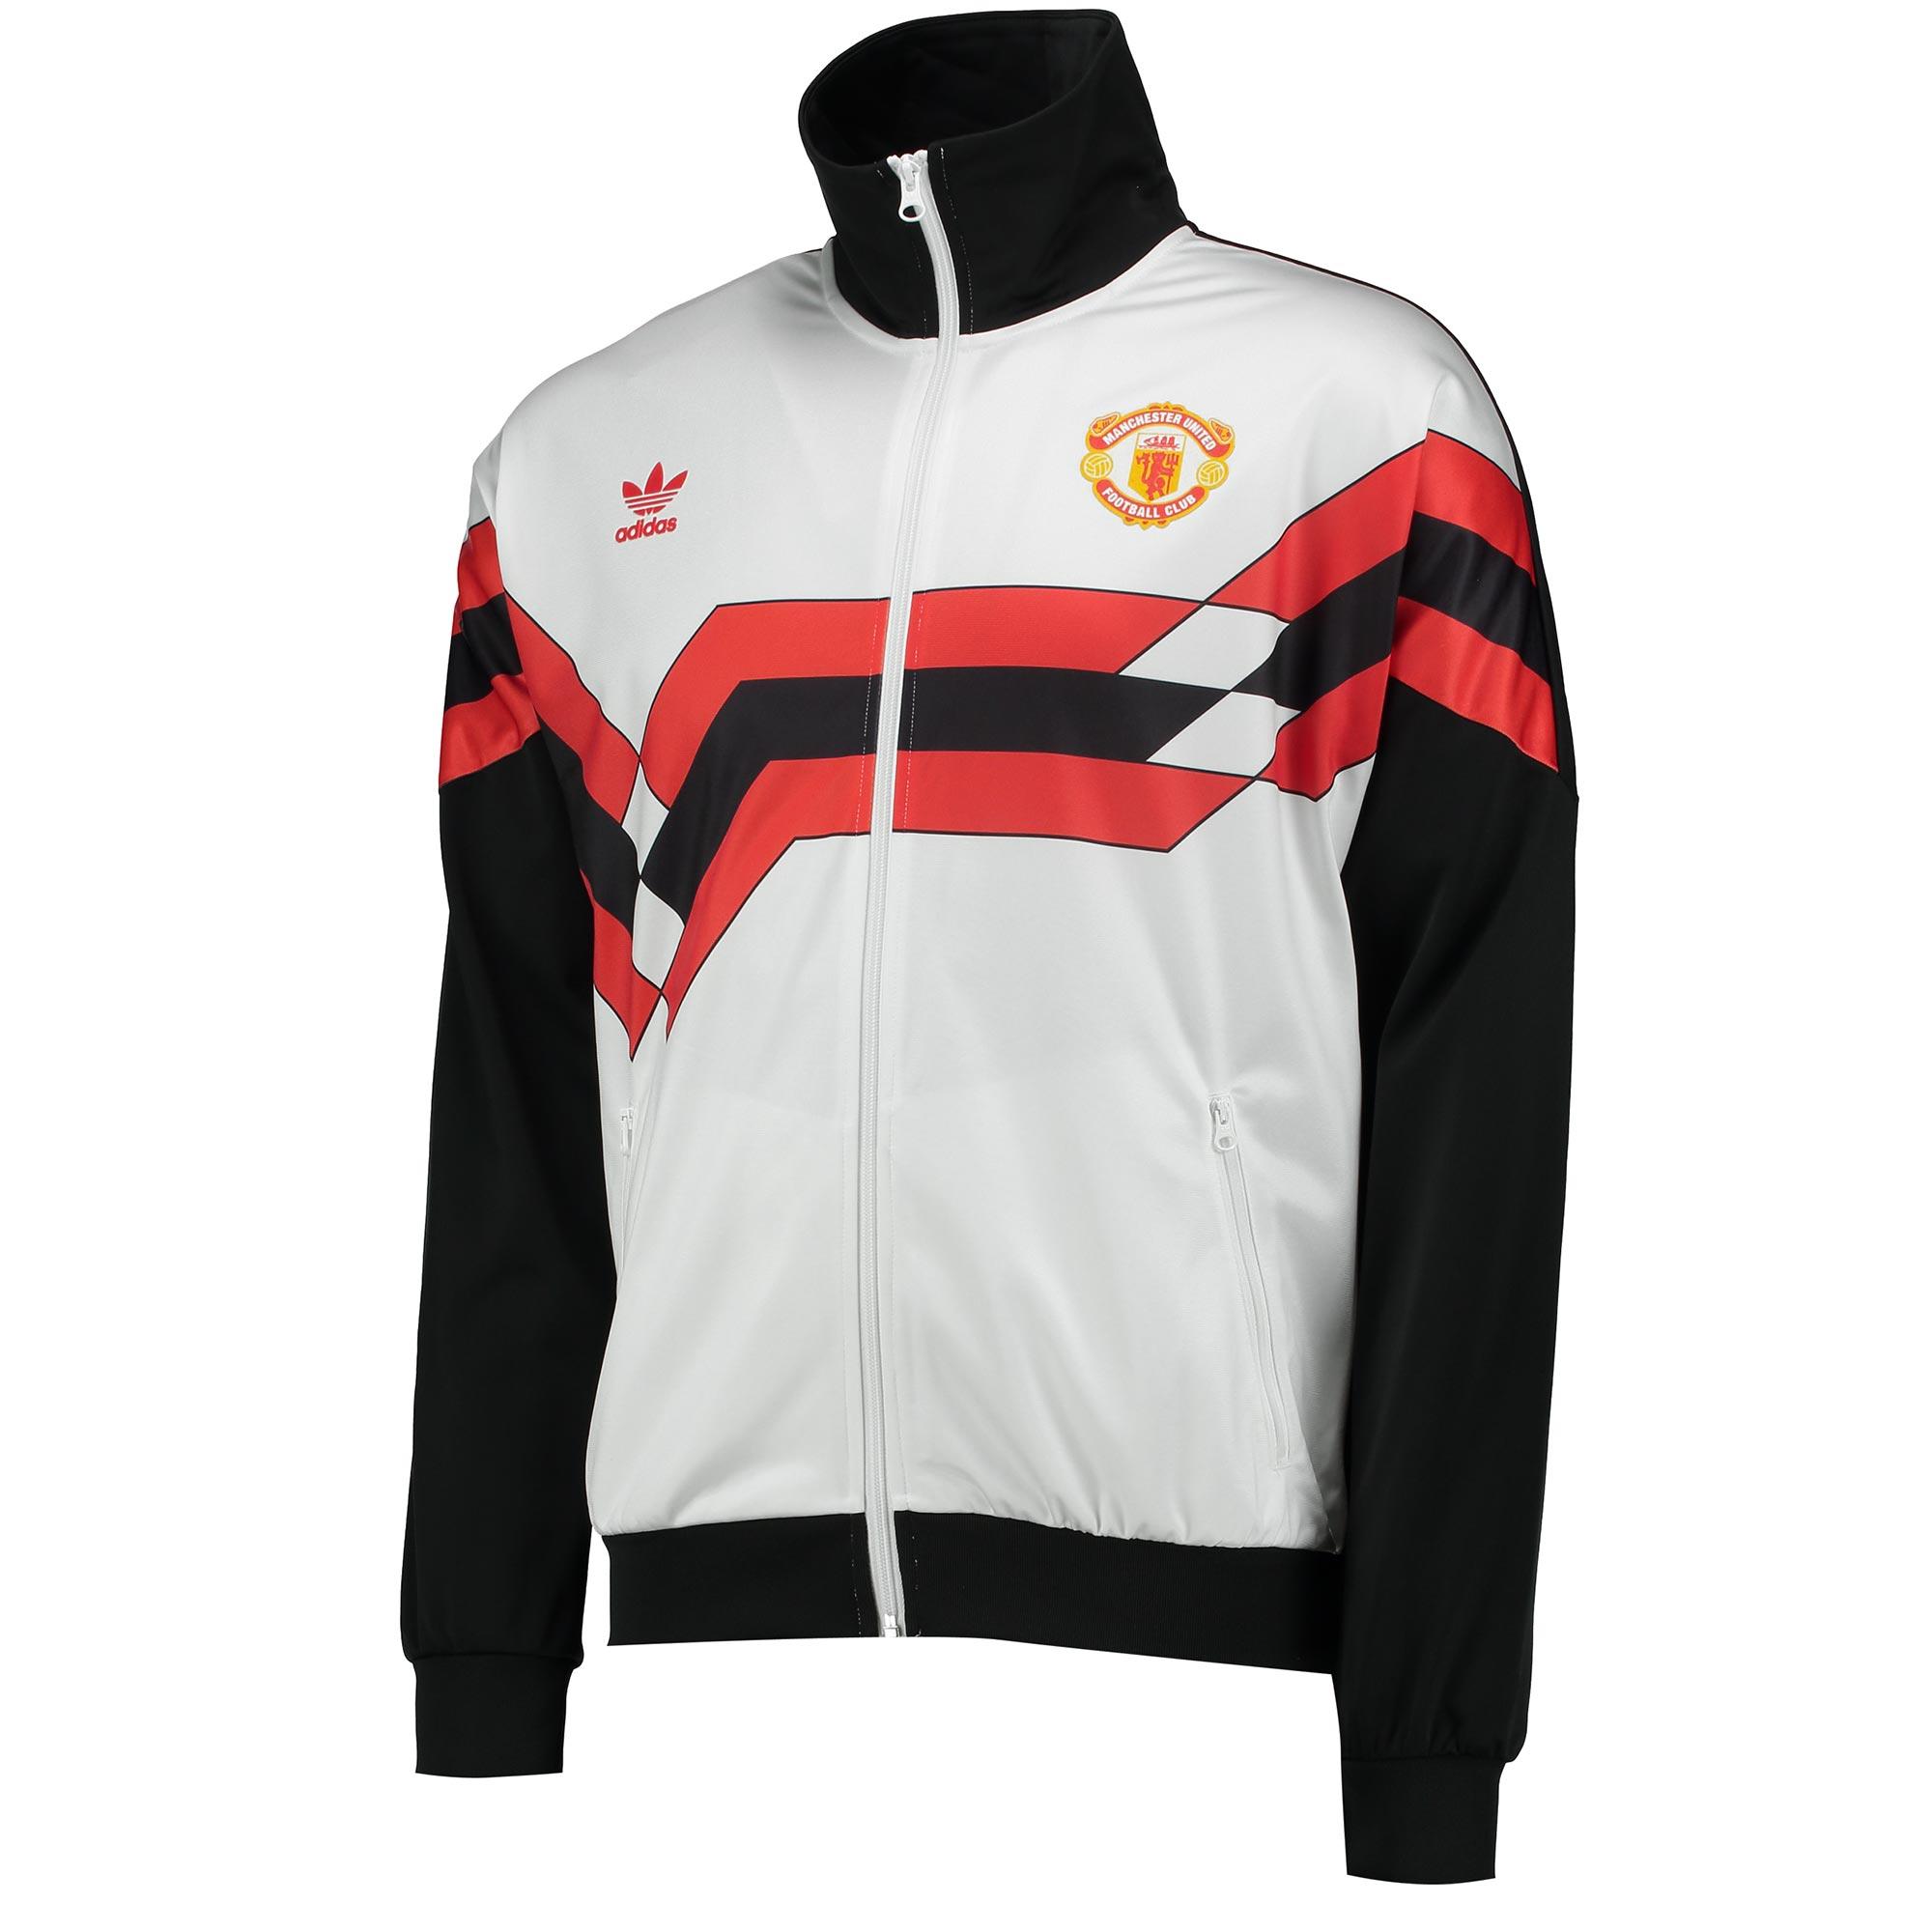 Manchester United Originals Track Top - White - Black